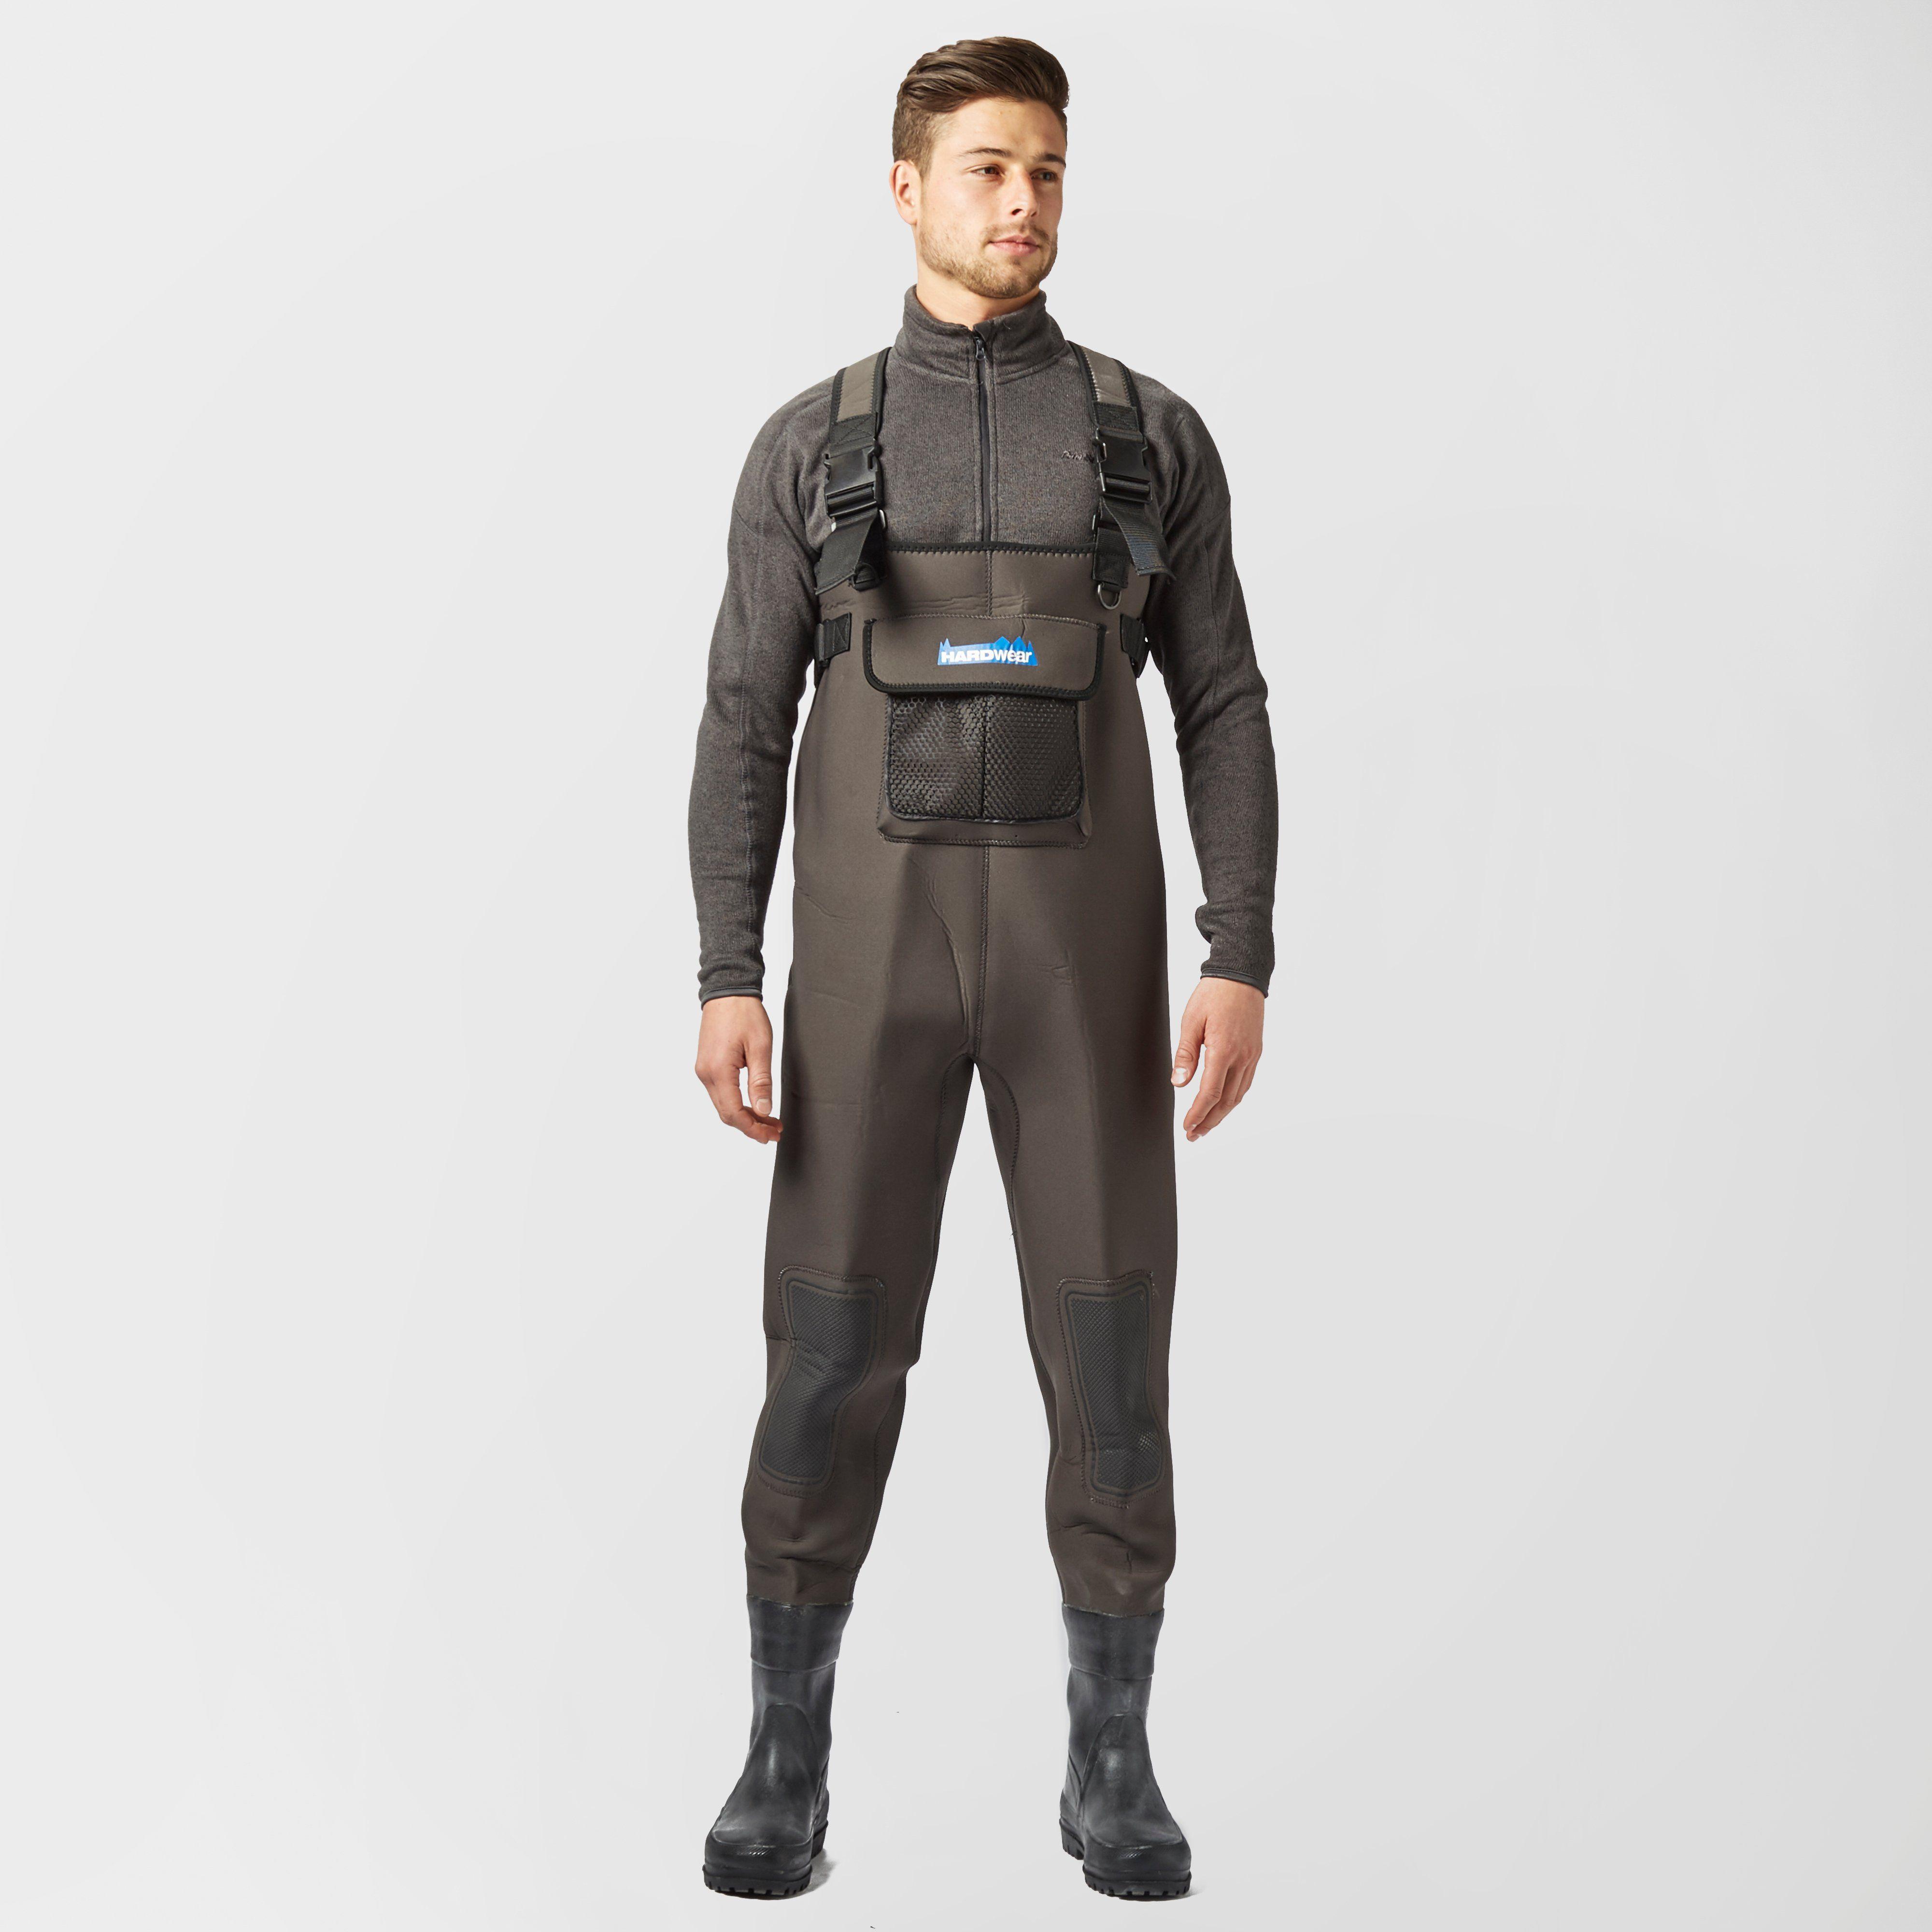 TFG Hardwear Pro Neoprene Chest Waders